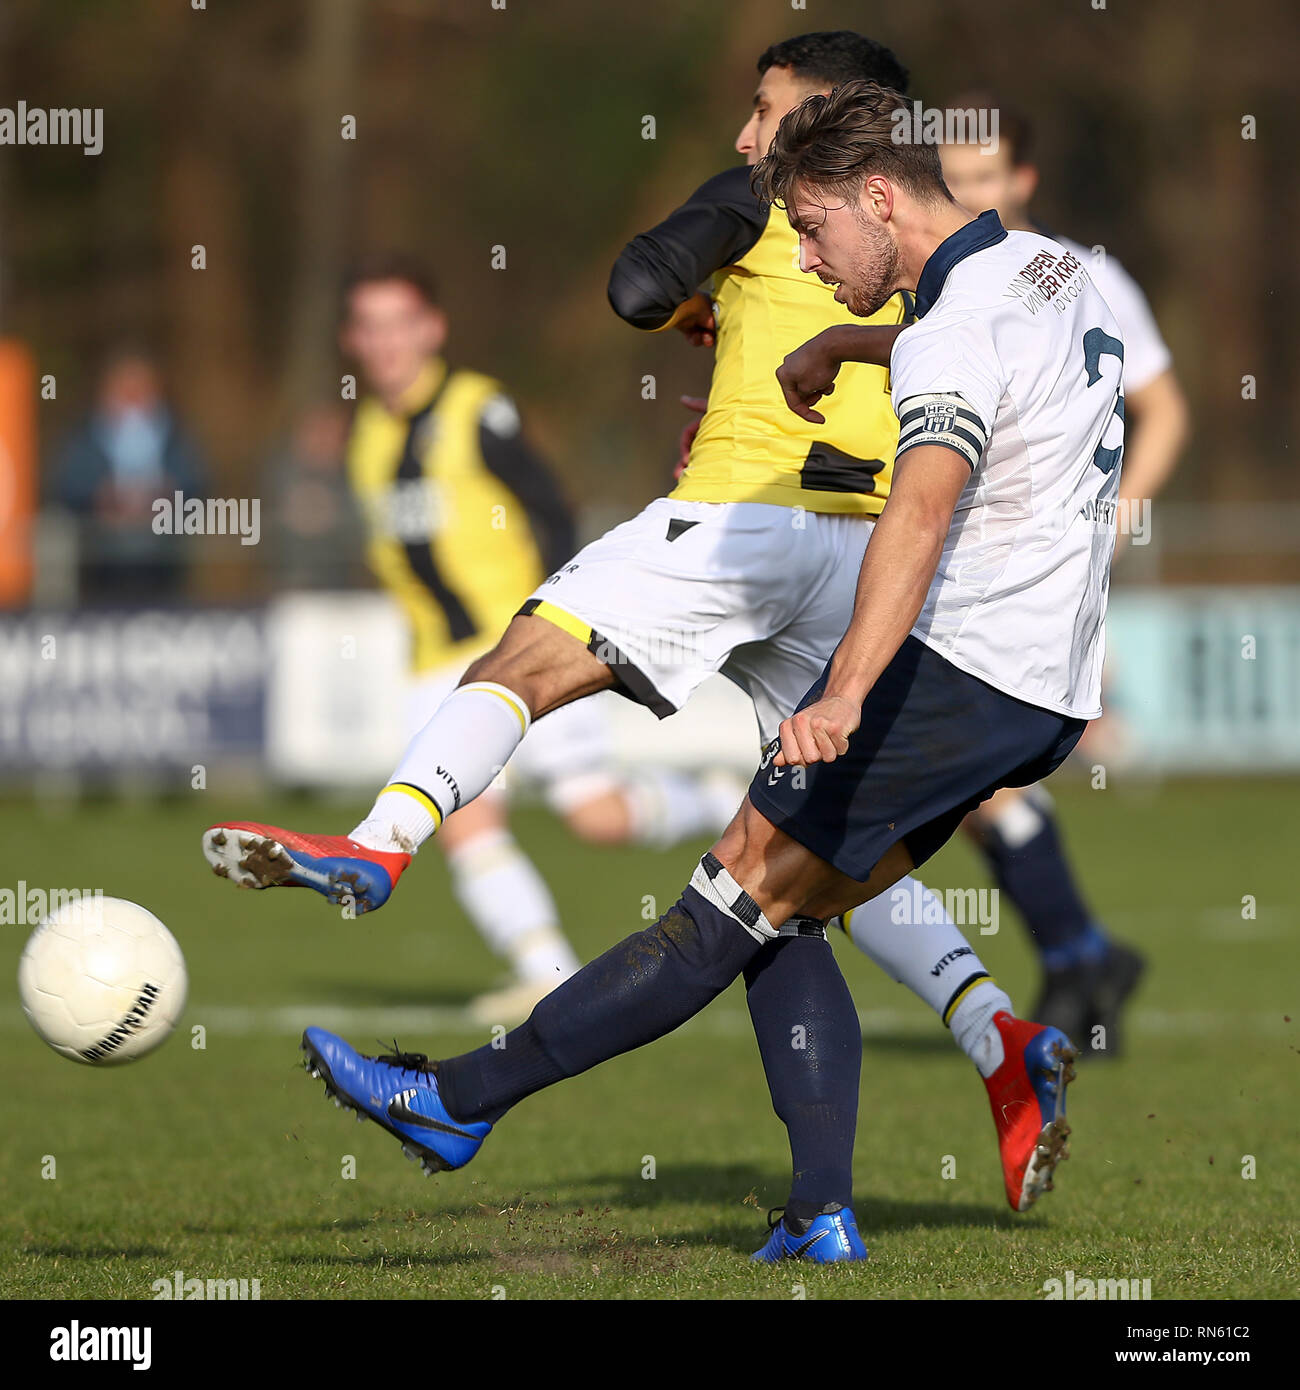 HAARLEM, 16-02-2019 , Sportpark Spanjaardlaan , Football , Dutch Tweede Divisie , season 2018 / 2019. Kon. HFC-player Oscar Wilffert (R) , Jong Vitesse player Hicham Acheffay during the match Koninklijke HFC - Jong Vitesse (1-0) - Stock Image